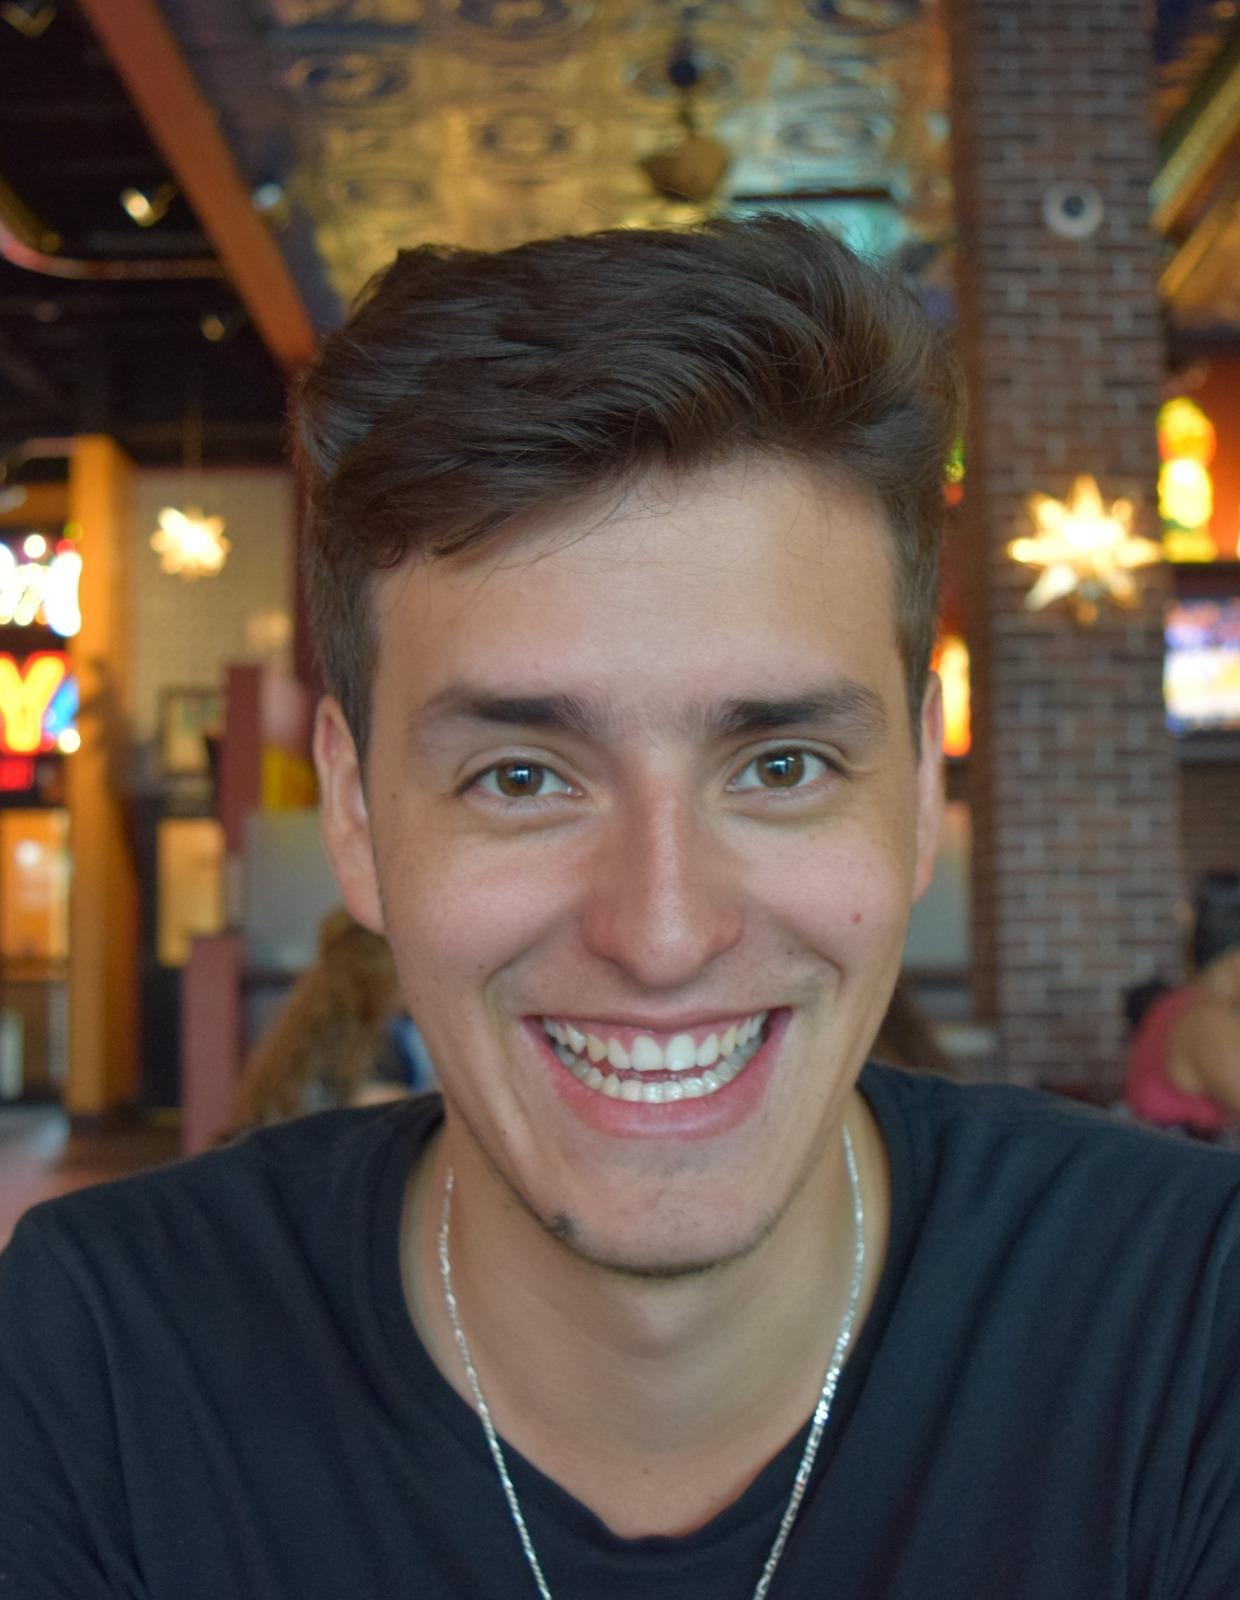 Mateo Espinosa Zarlenga